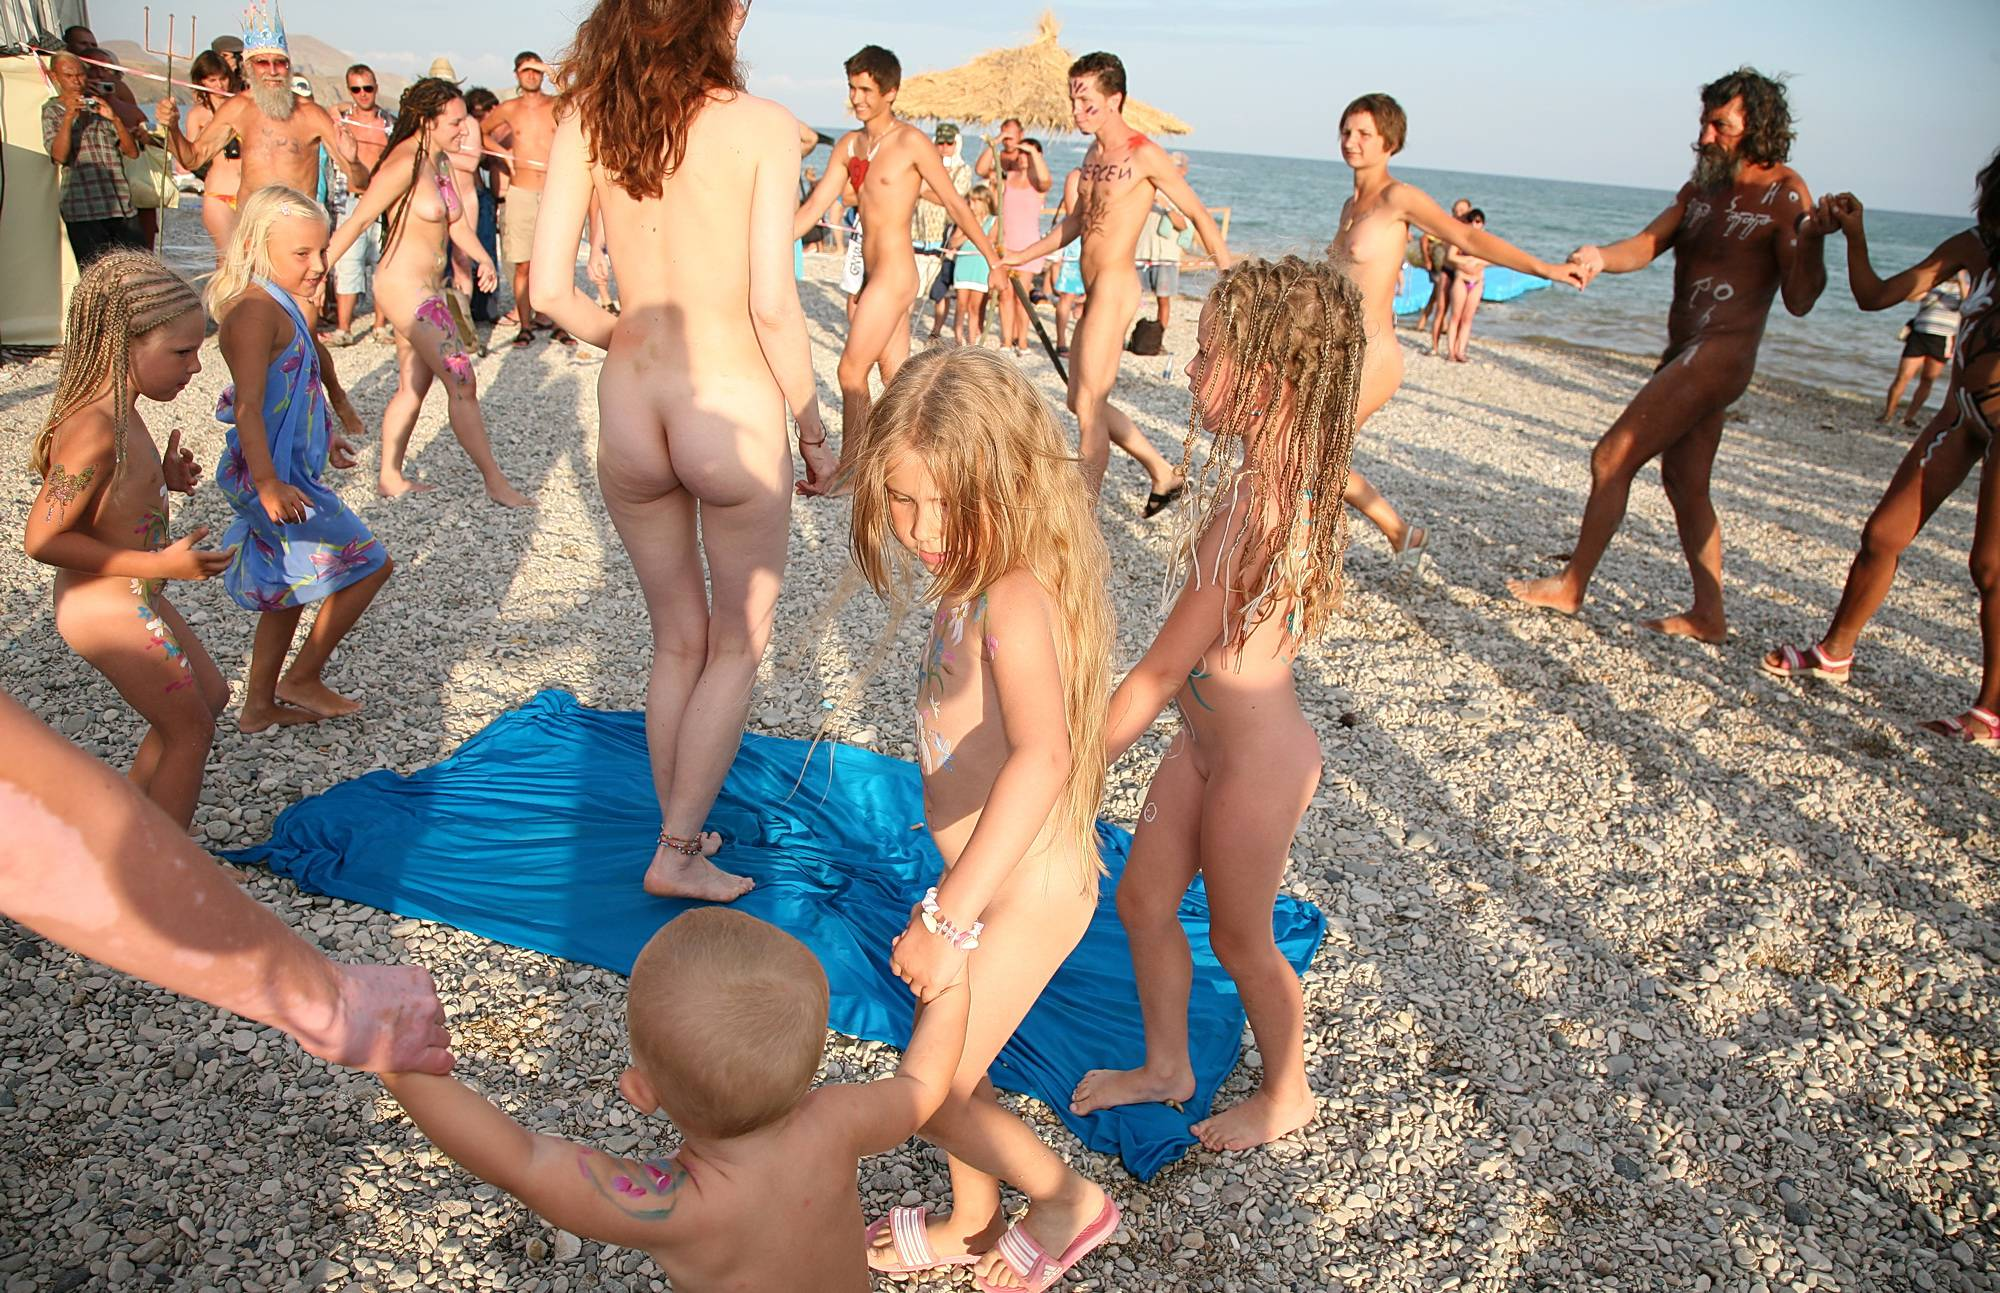 Nudist Photos Life On Beautiful Sands - 2